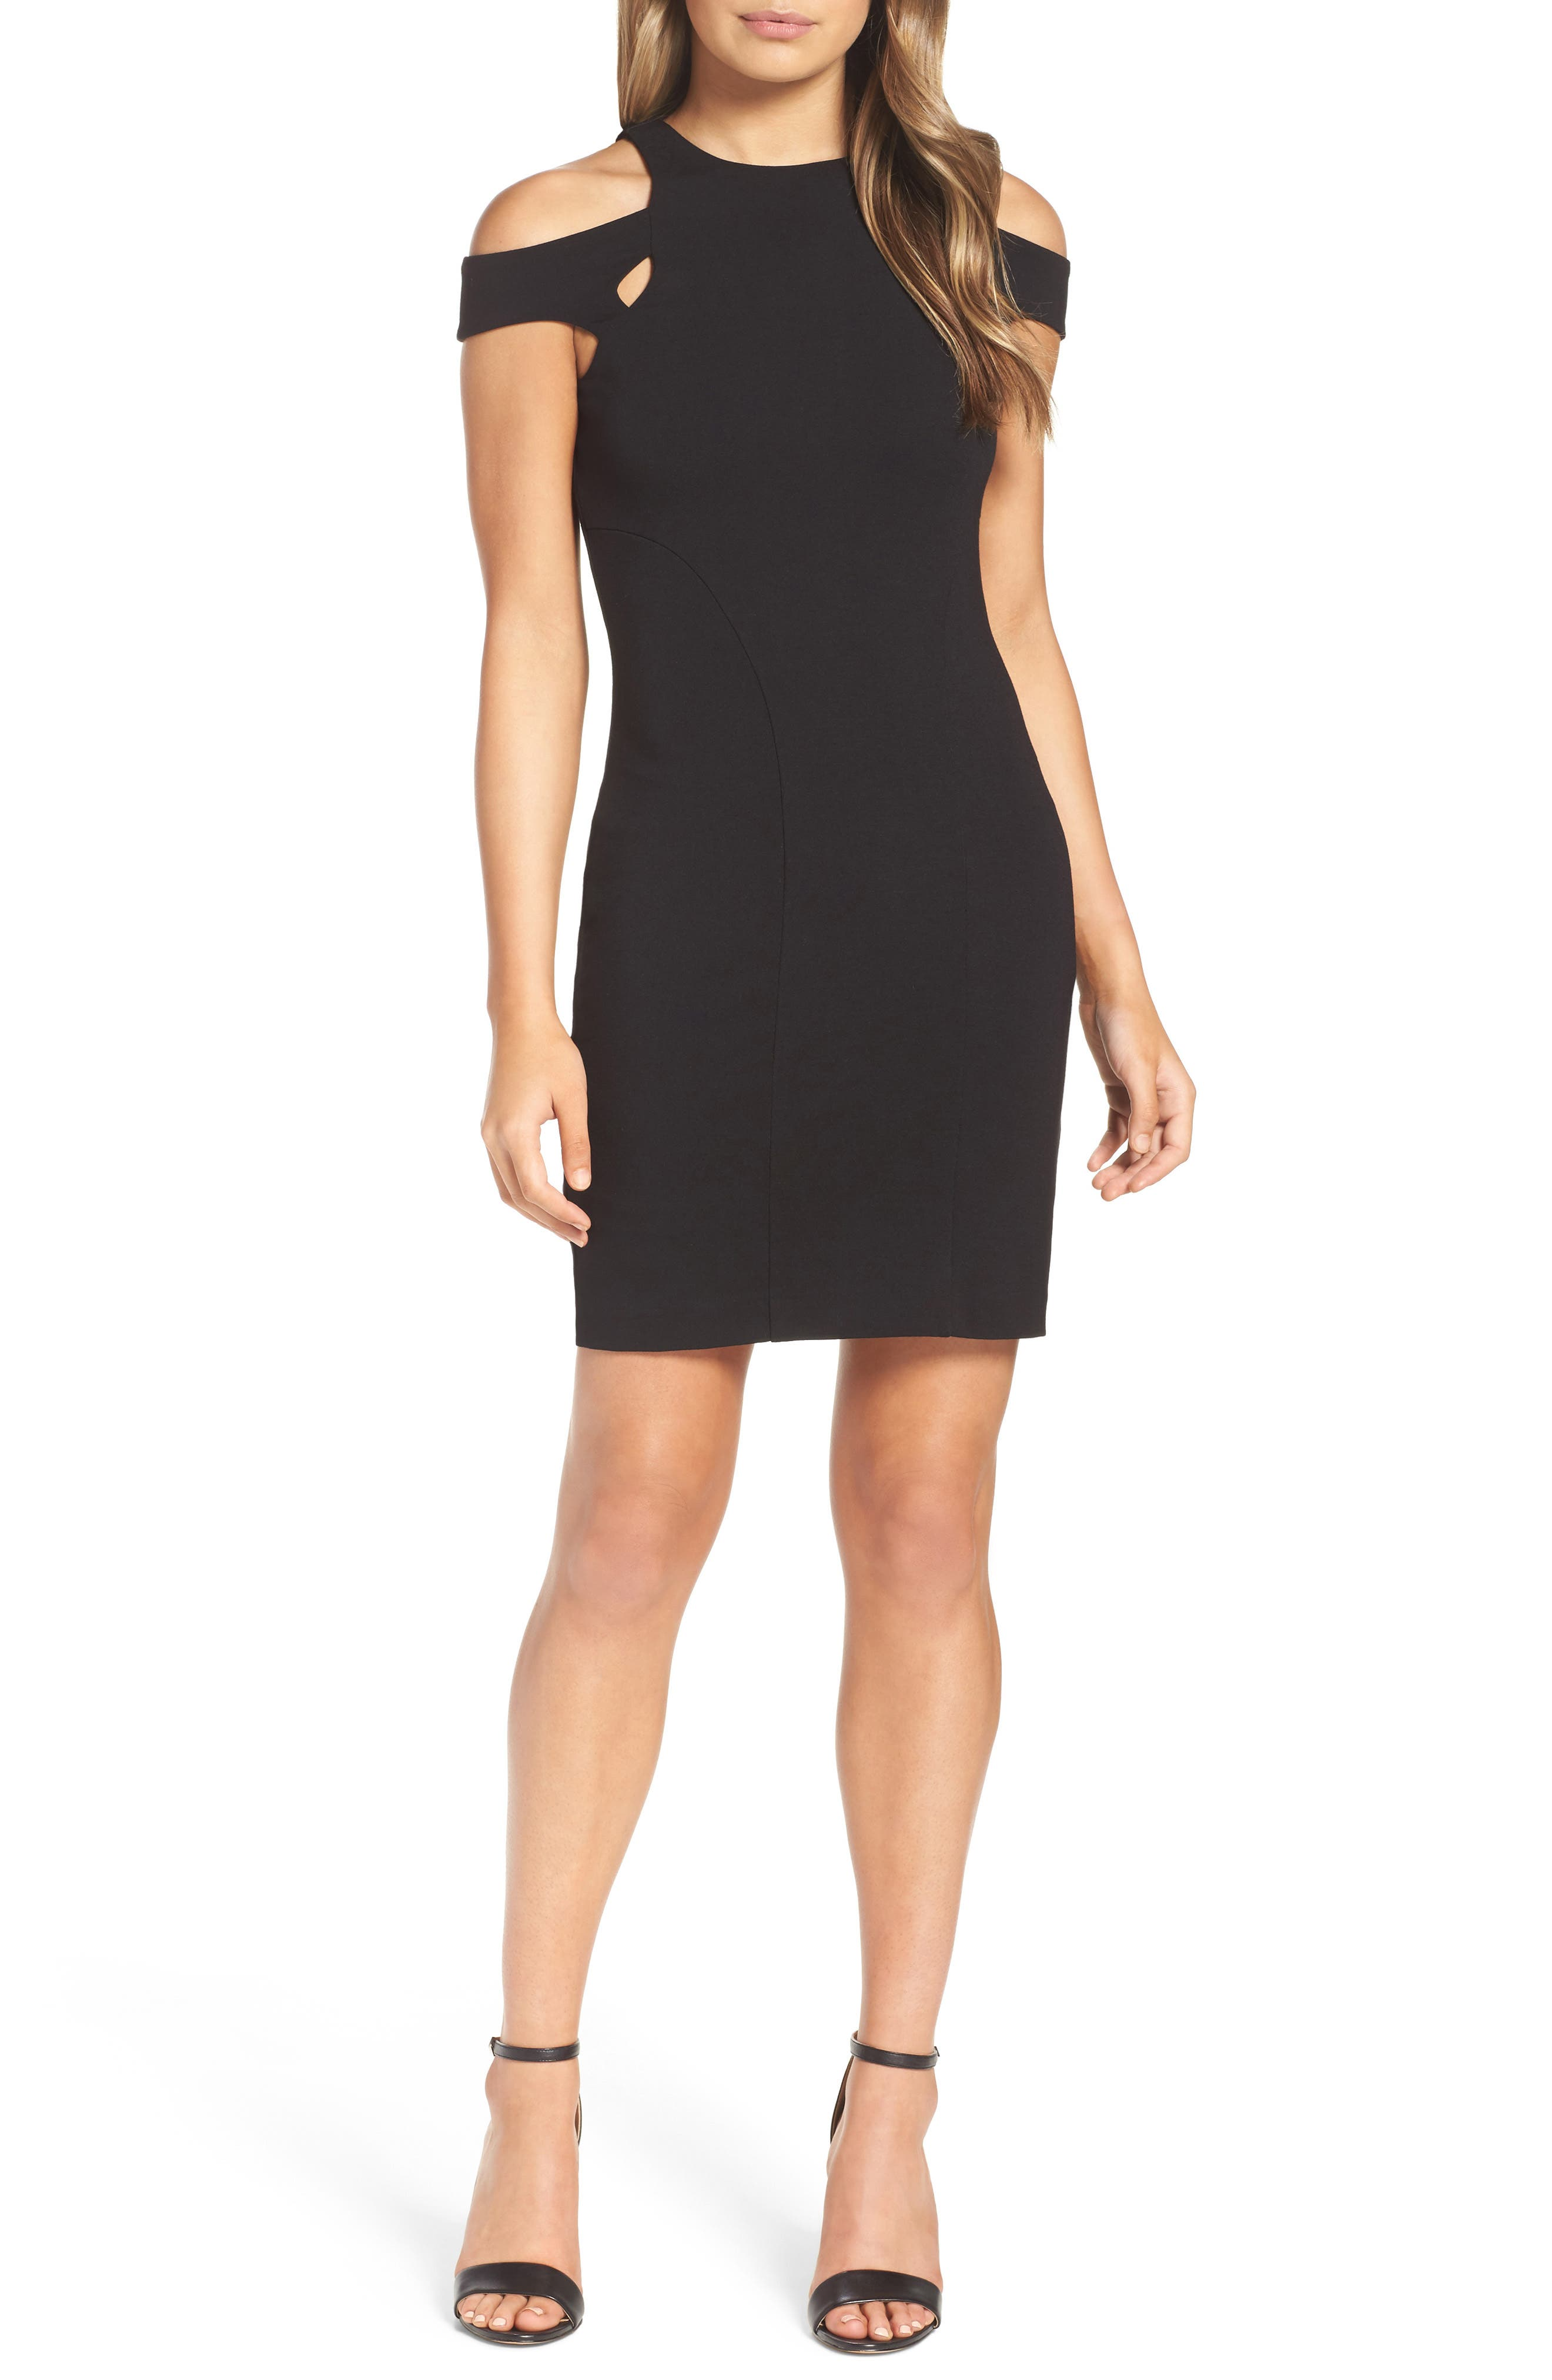 Muy Caliente Cold Shoulder Body-Con Dress,                         Main,                         color, 001